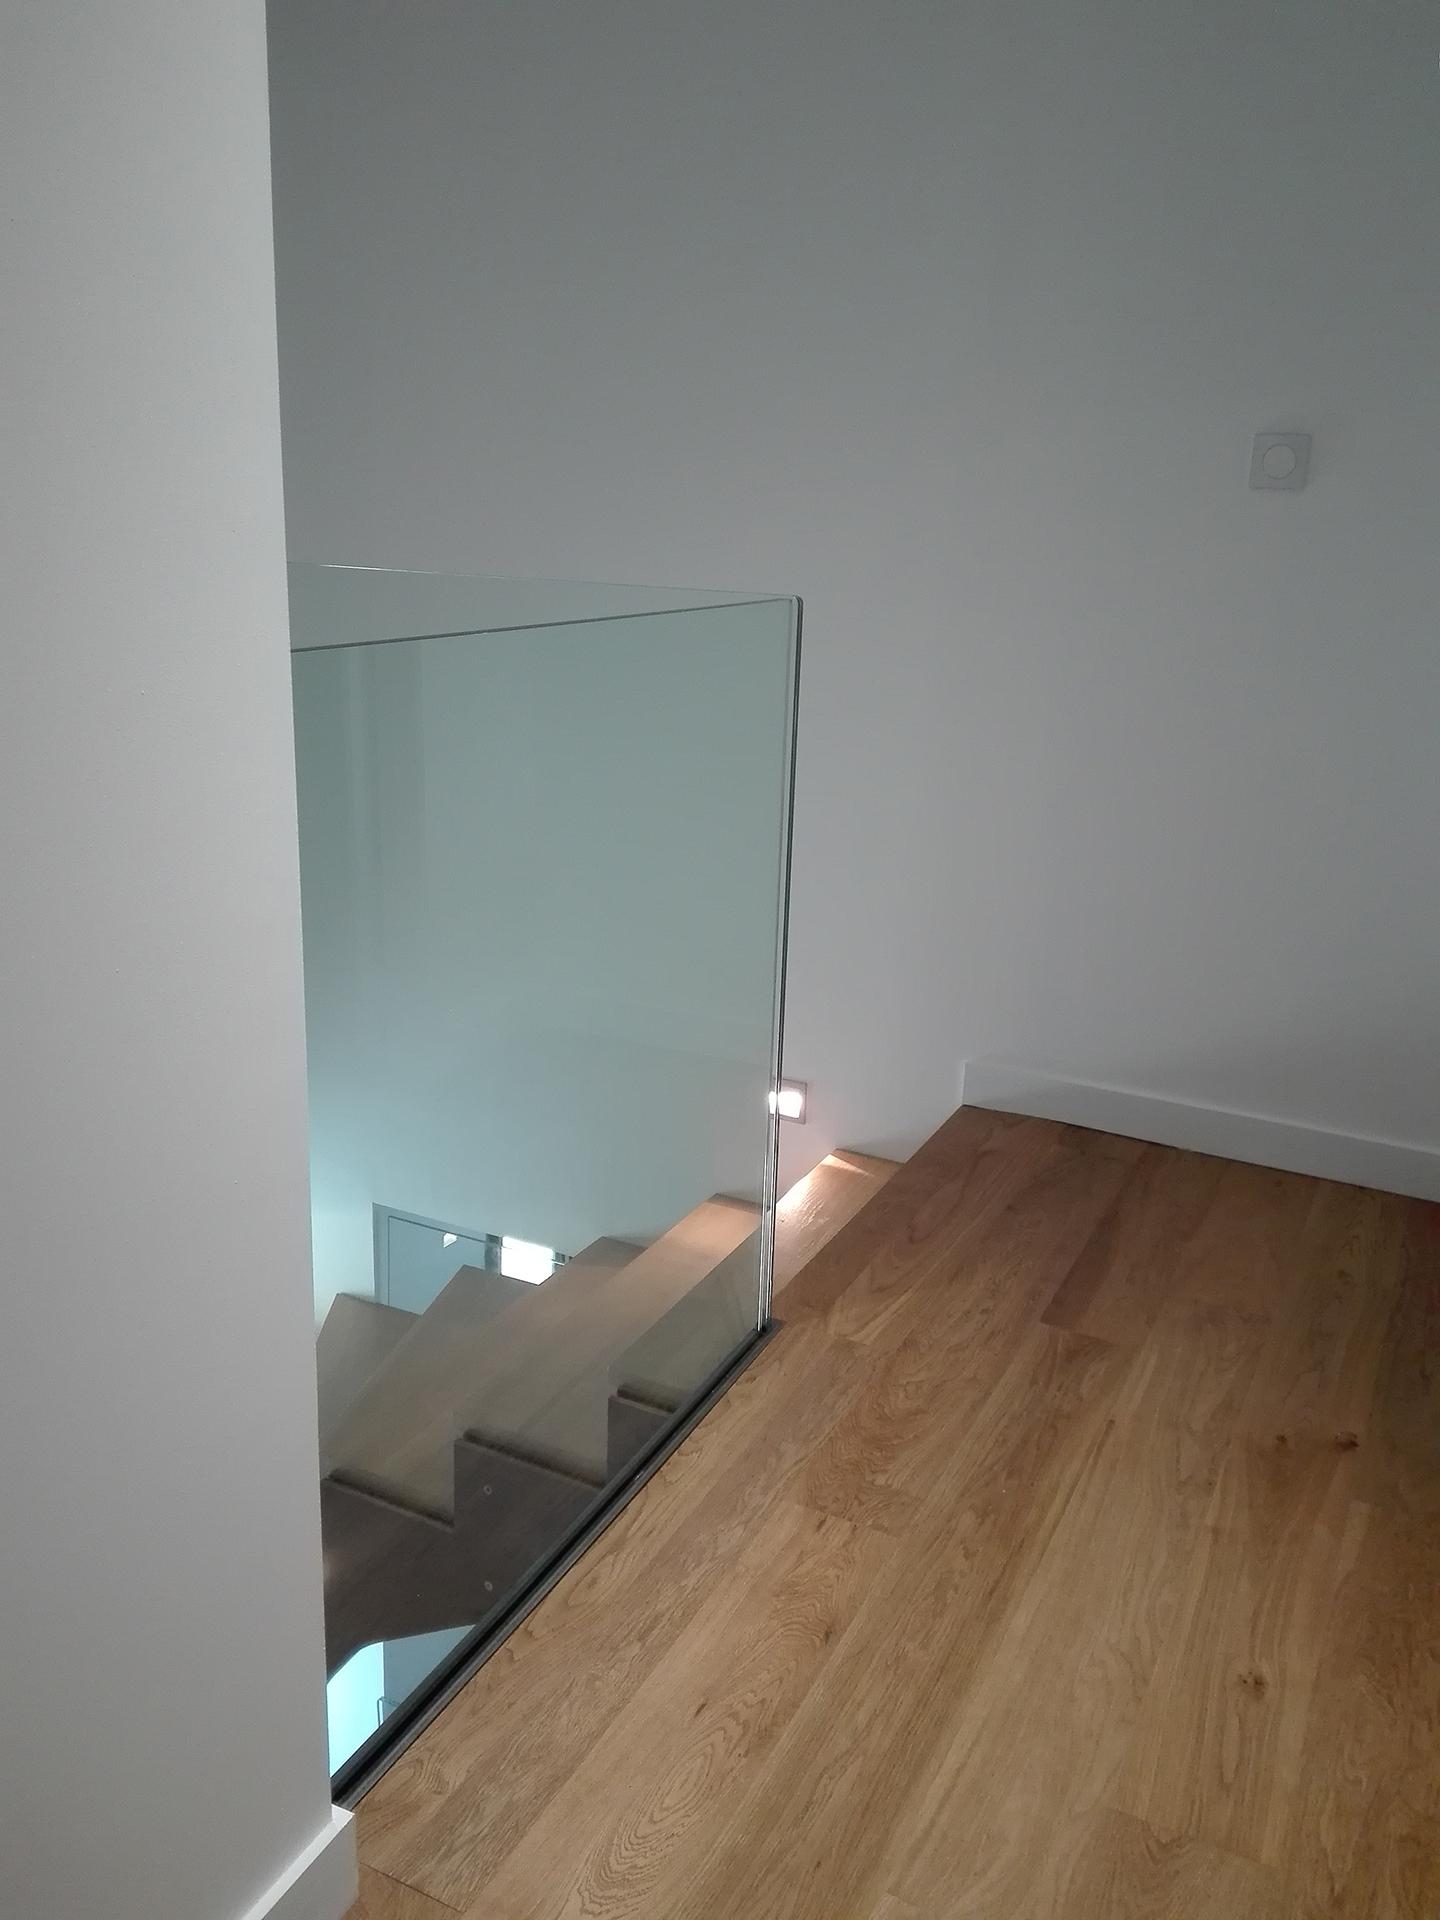 dubai steel contemporain. Black Bedroom Furniture Sets. Home Design Ideas